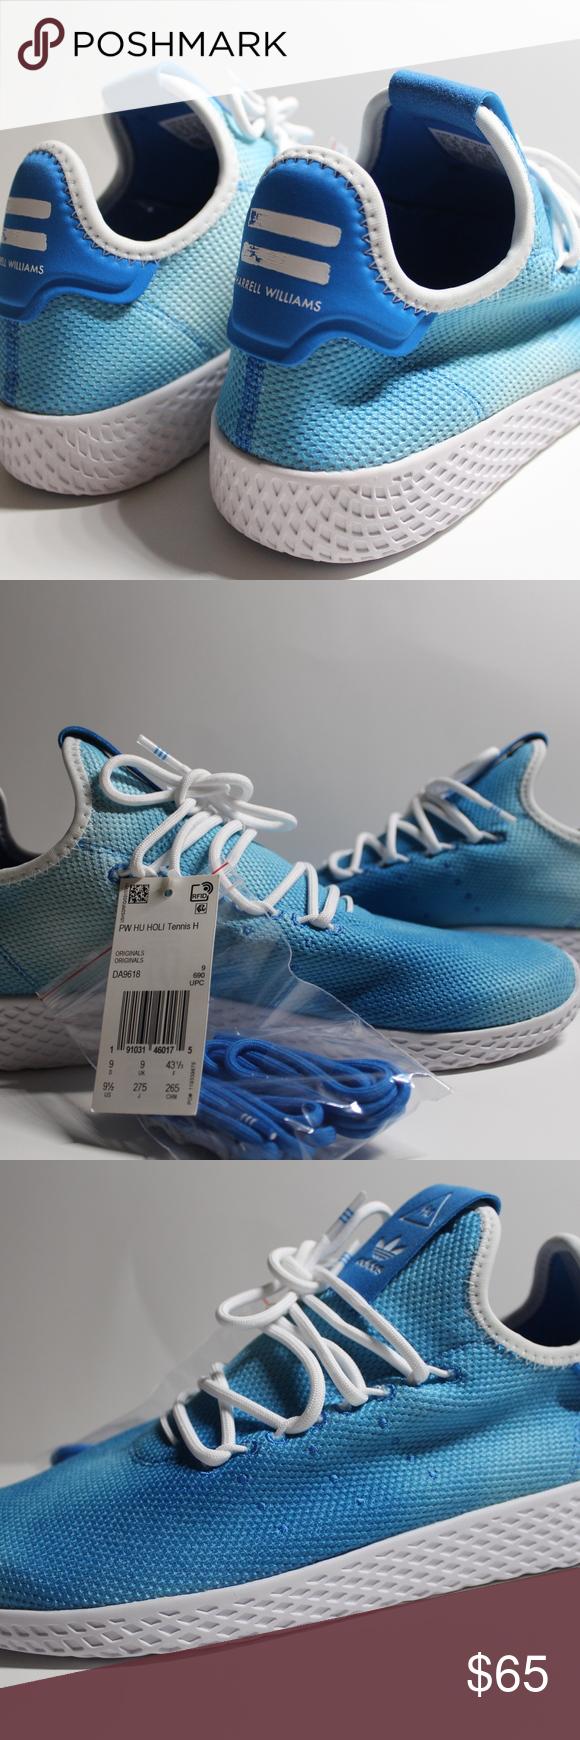 pharrell williams shoe size